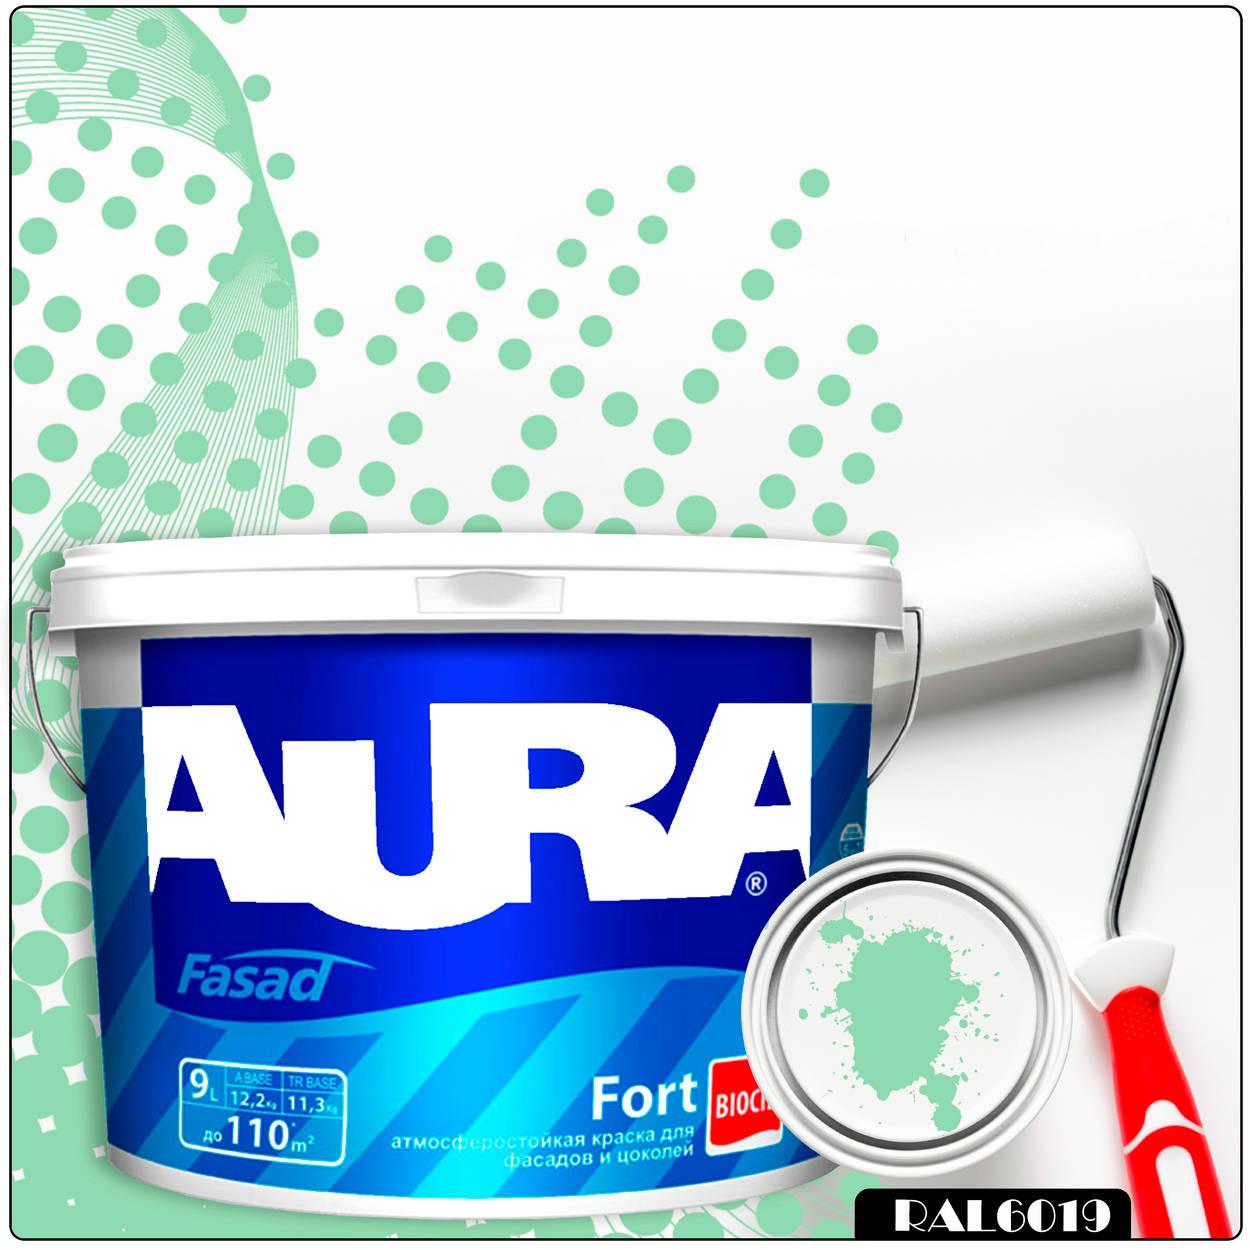 Фото 20 - Краска Aura Fasad Fort, RAL 6019 Бело-зелёный, латексная, матовая, для фасада и цоколей, 9л, Аура.